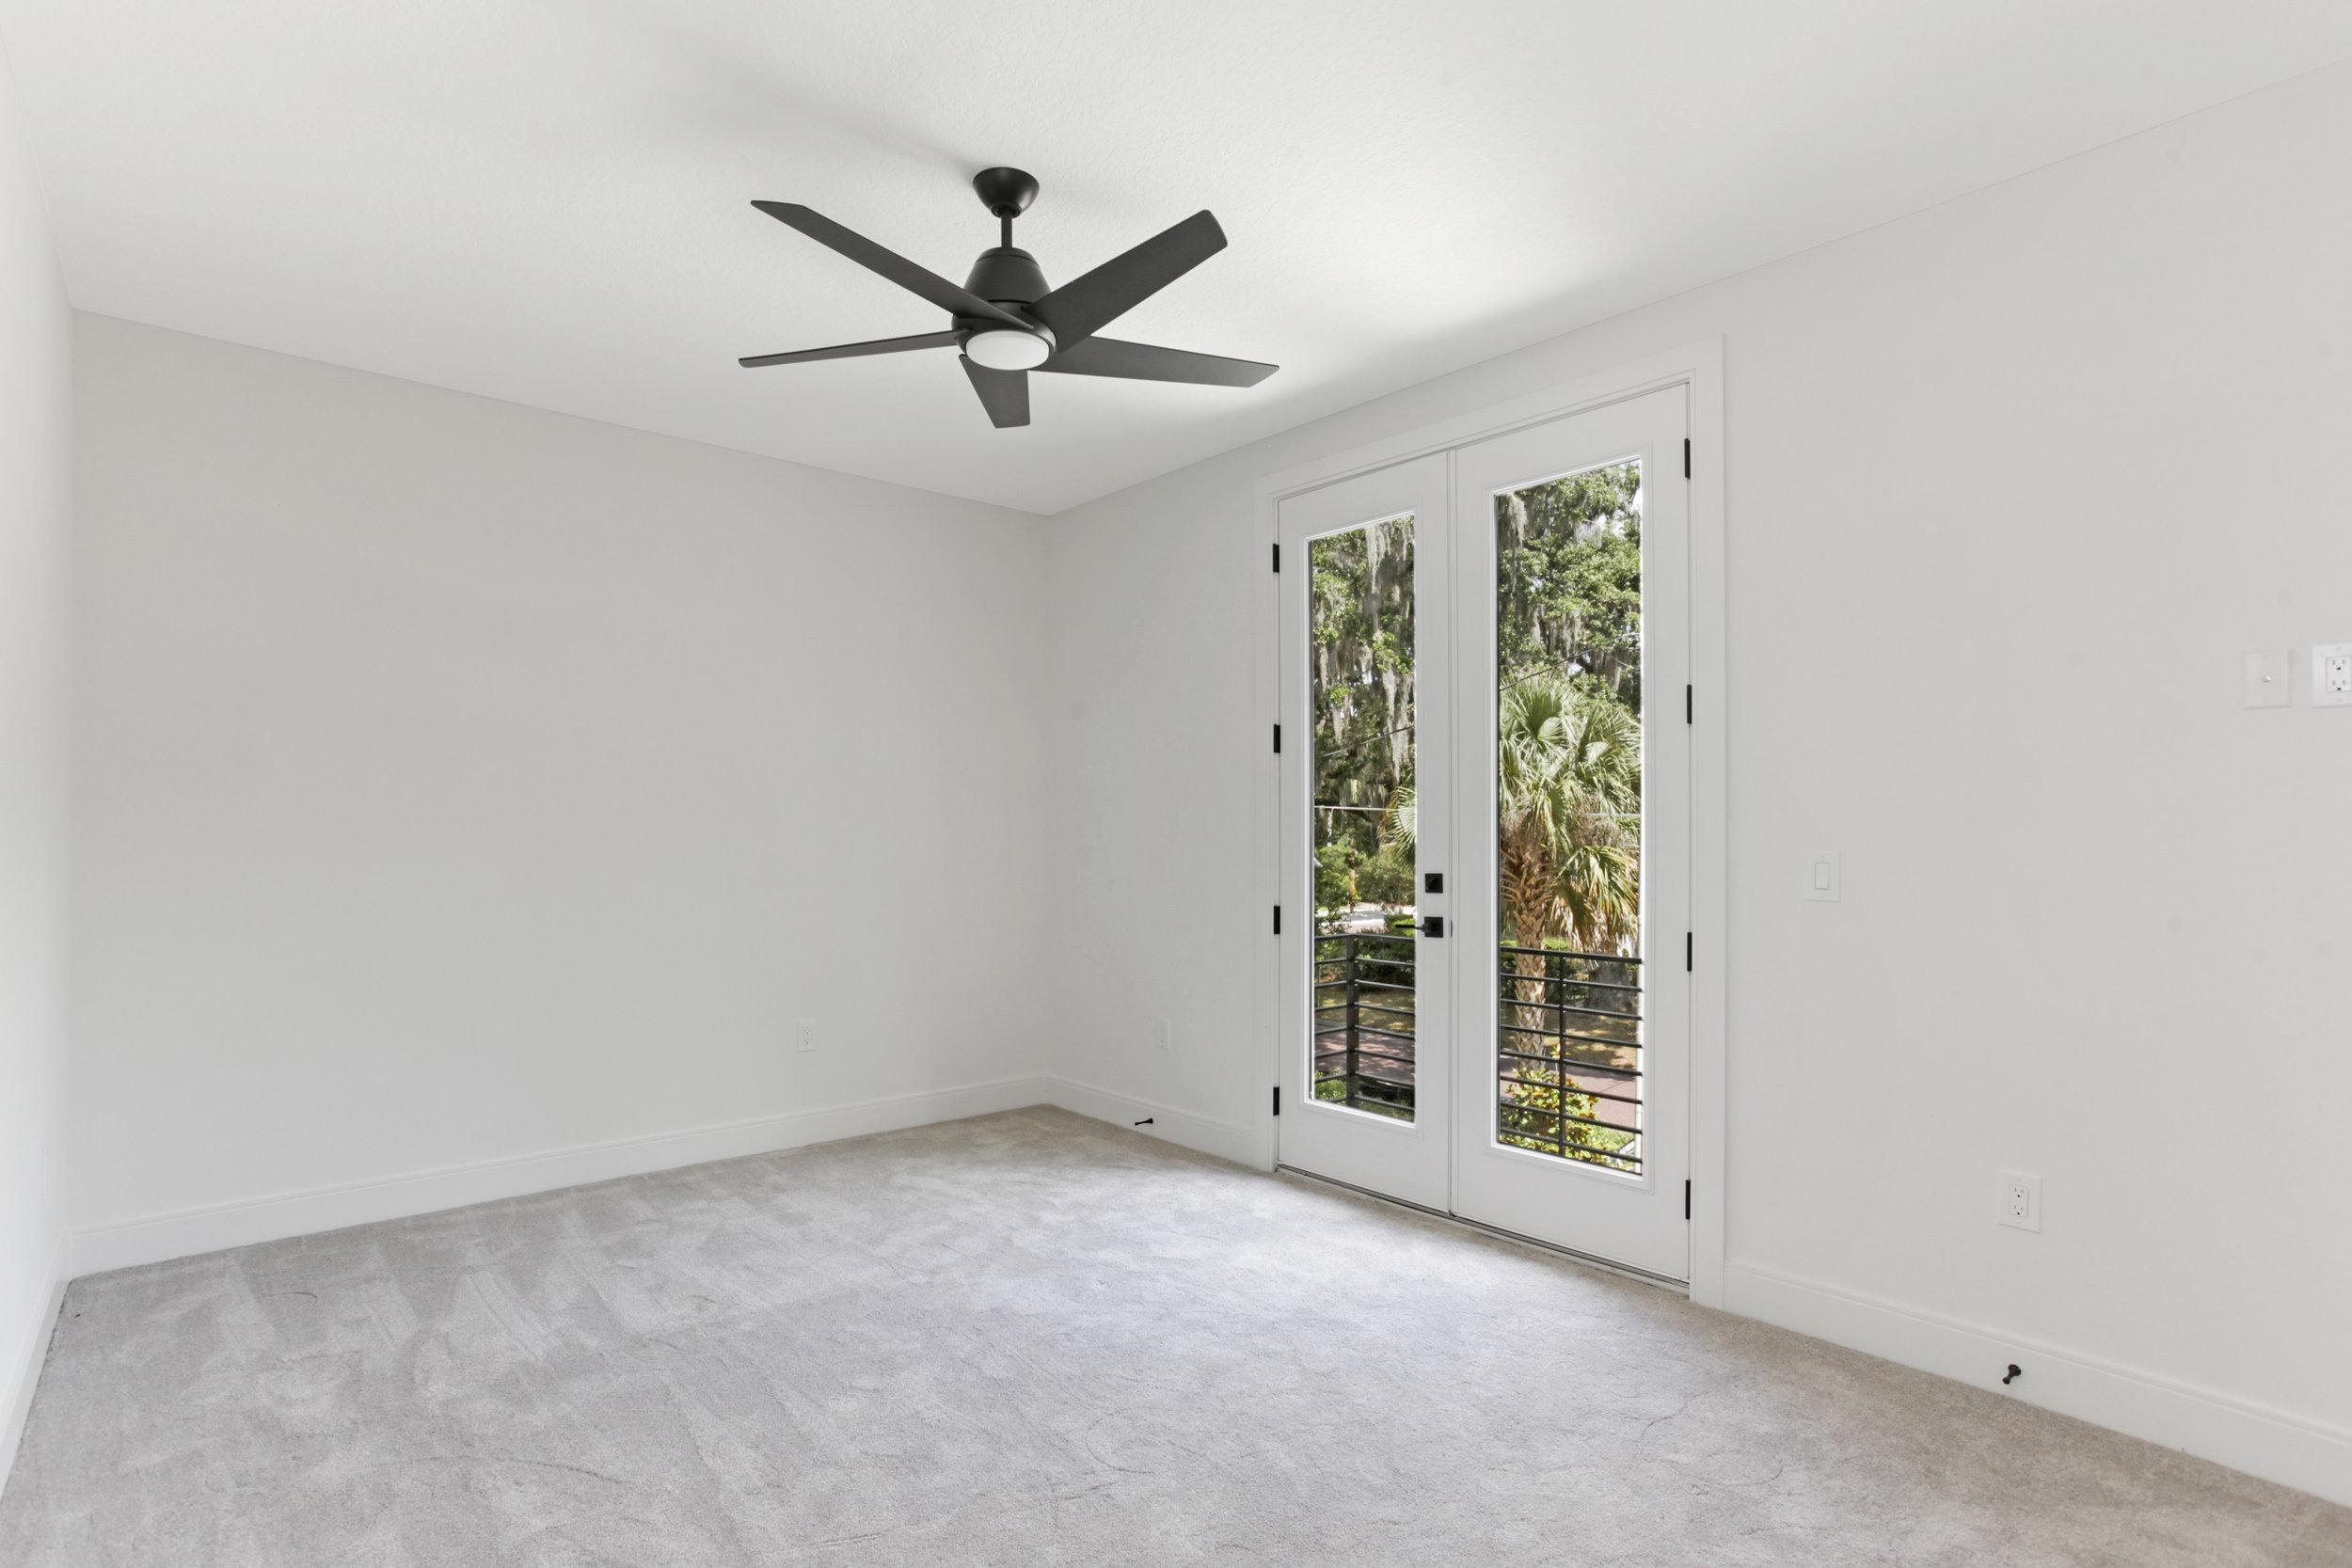 1008 Greenwood St, Orlando_IMG_5275.jpg